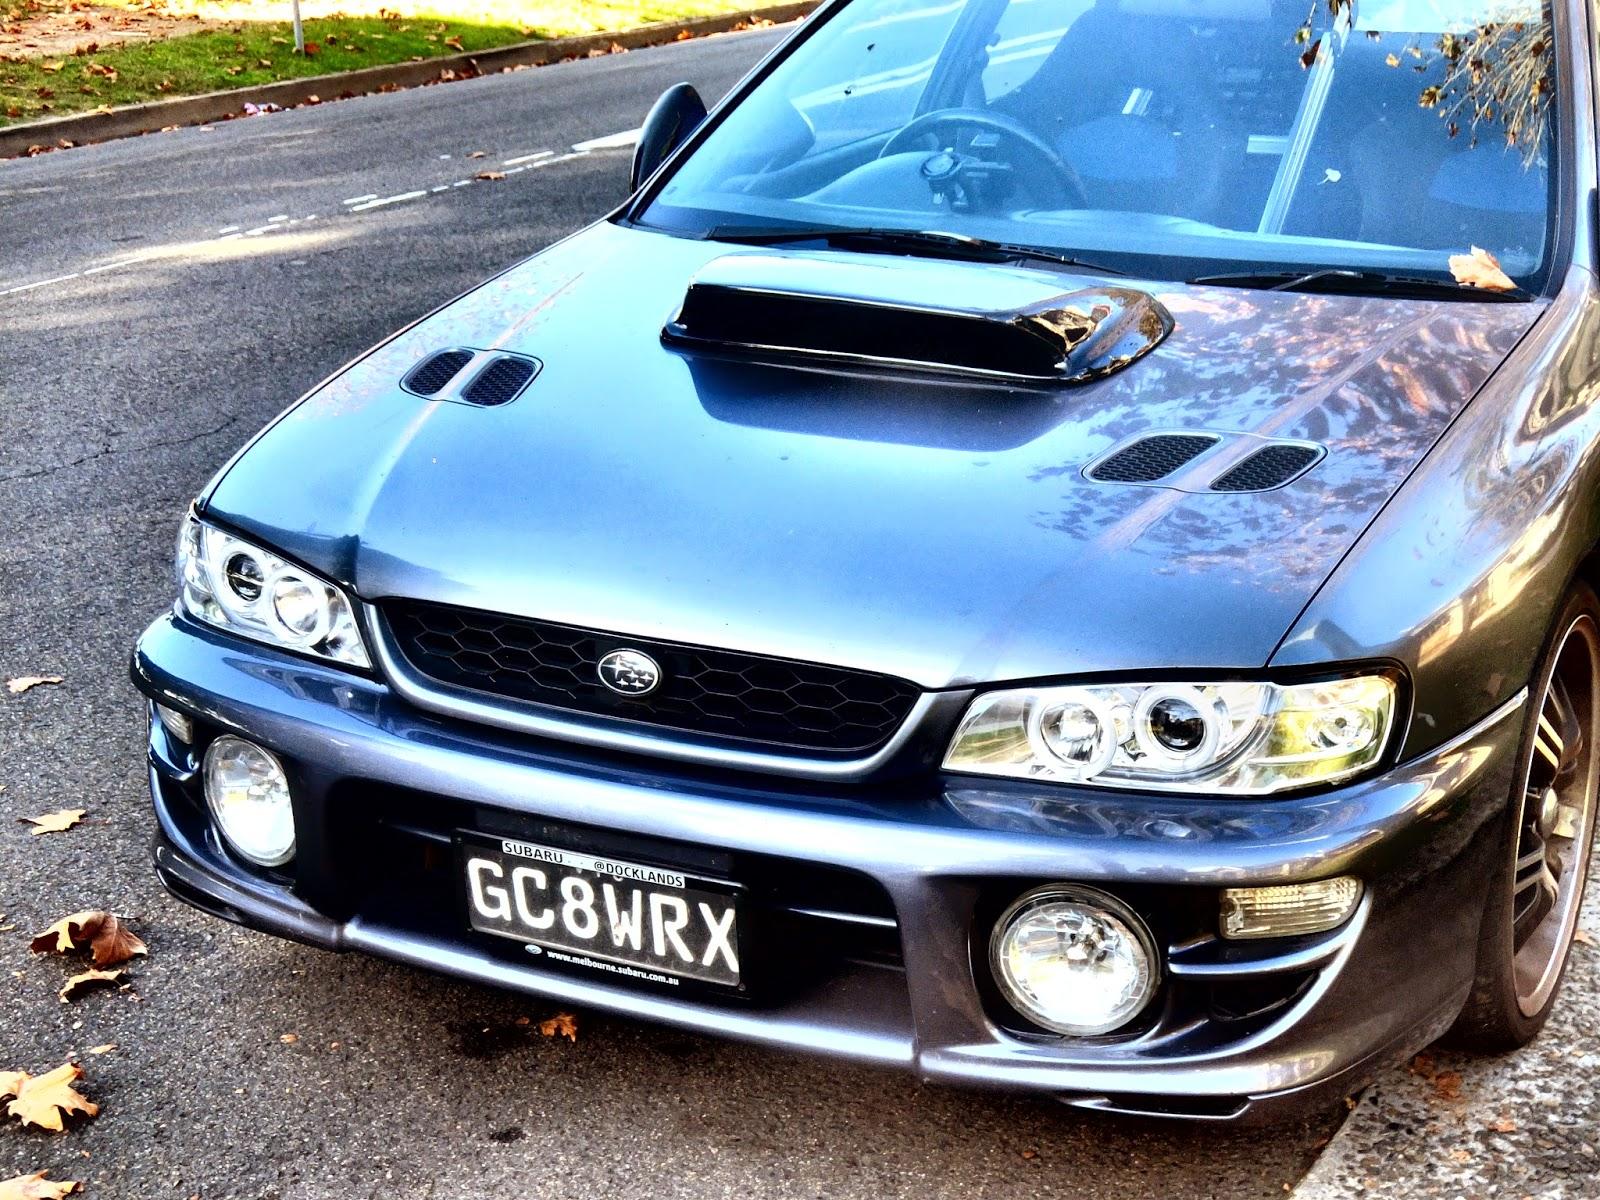 Aussie Old Parked Cars 1999 Subaru Impreza Wrx Sti Gc8g